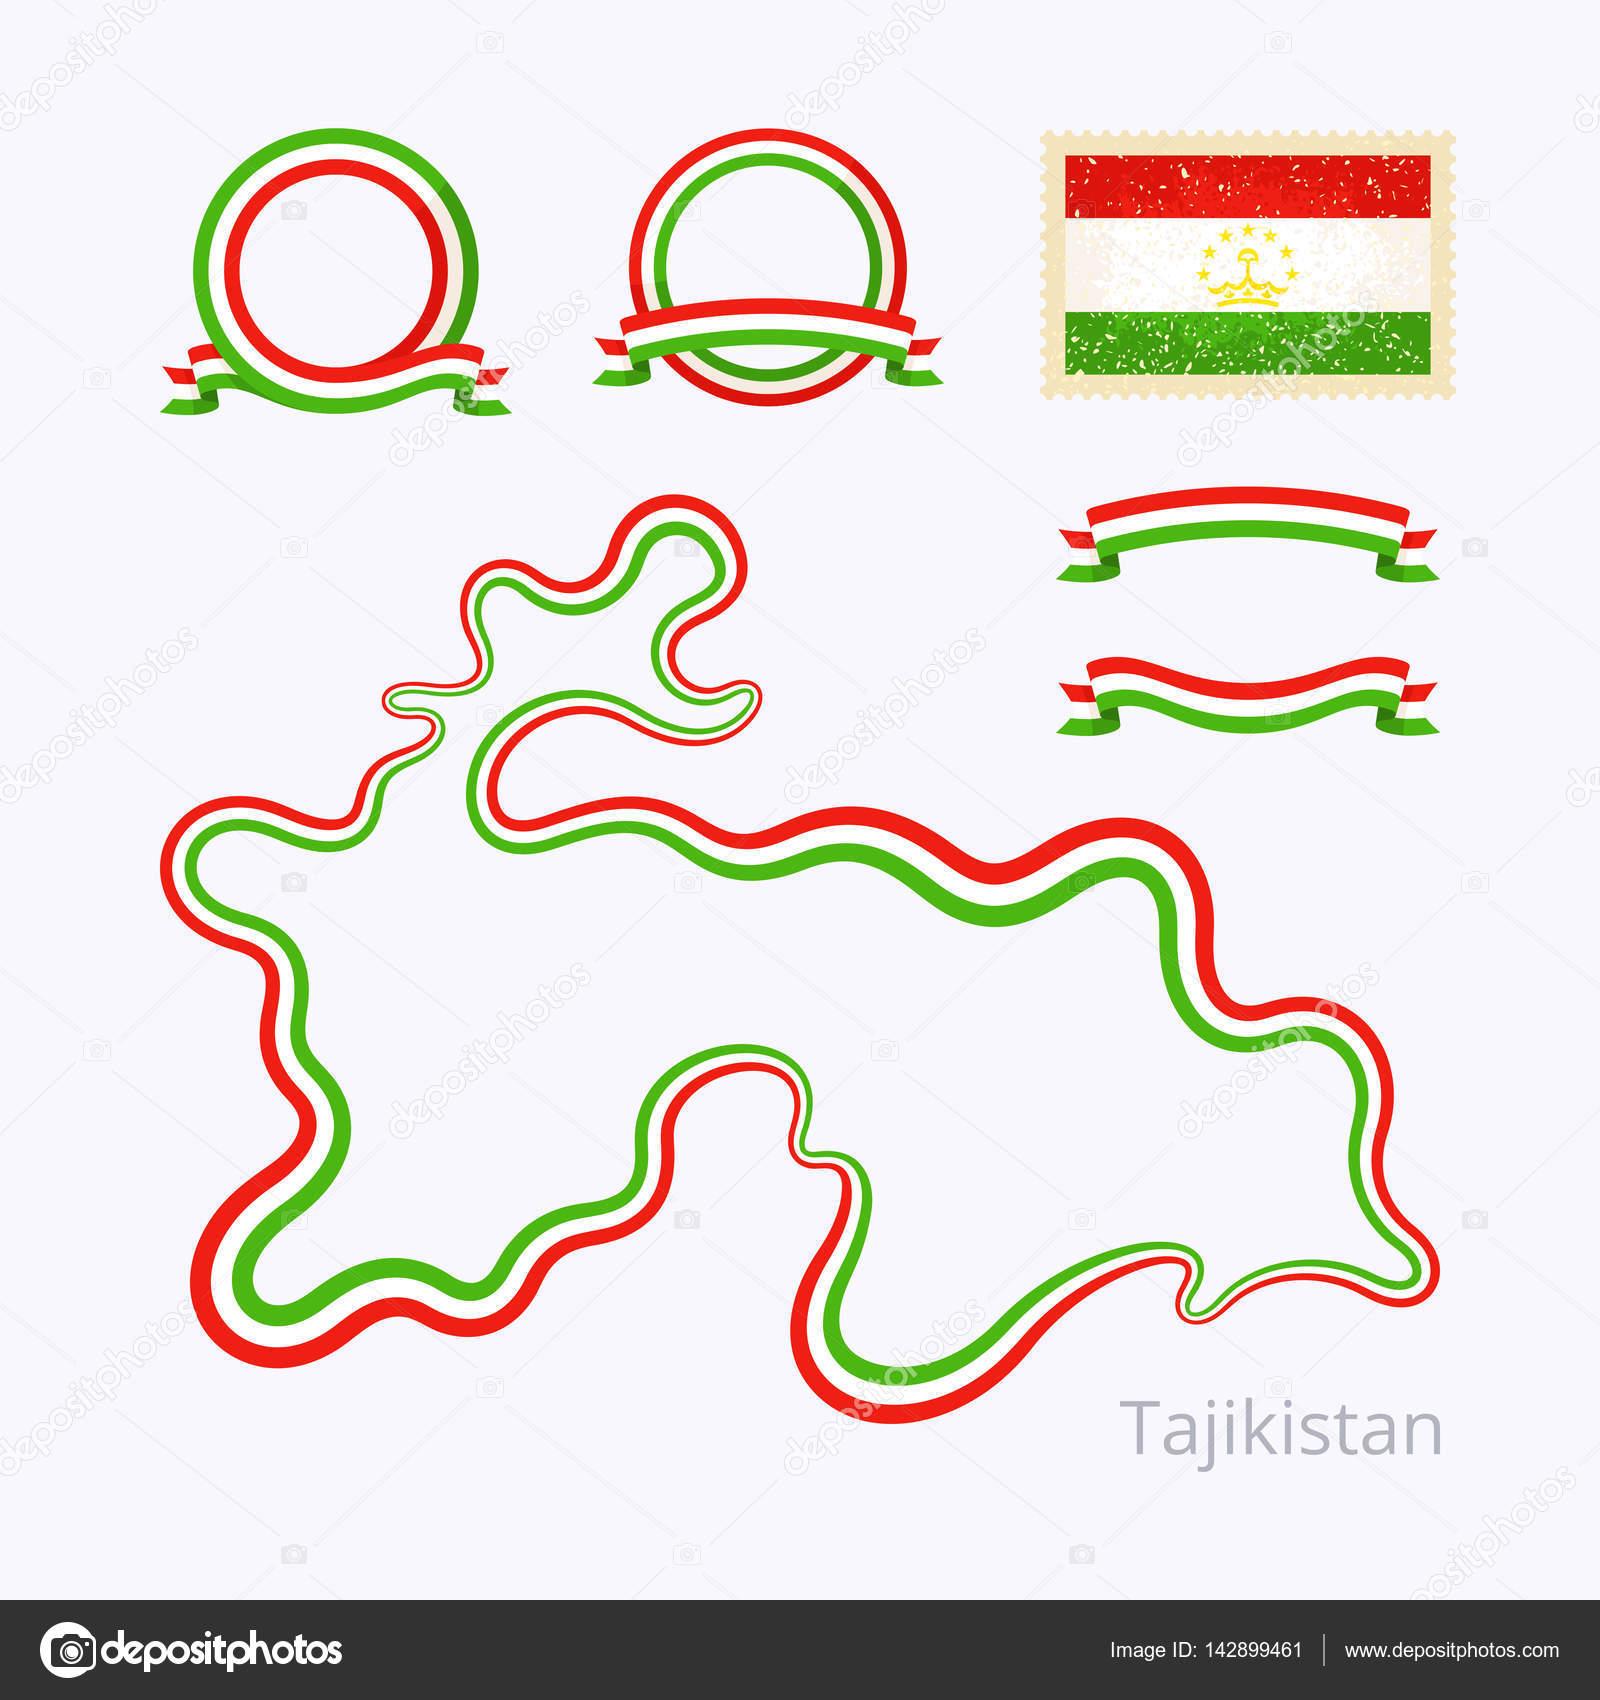 Tajikistan Outline Map And Ribbons Stock Vector Tindo - Tajikistan map vector